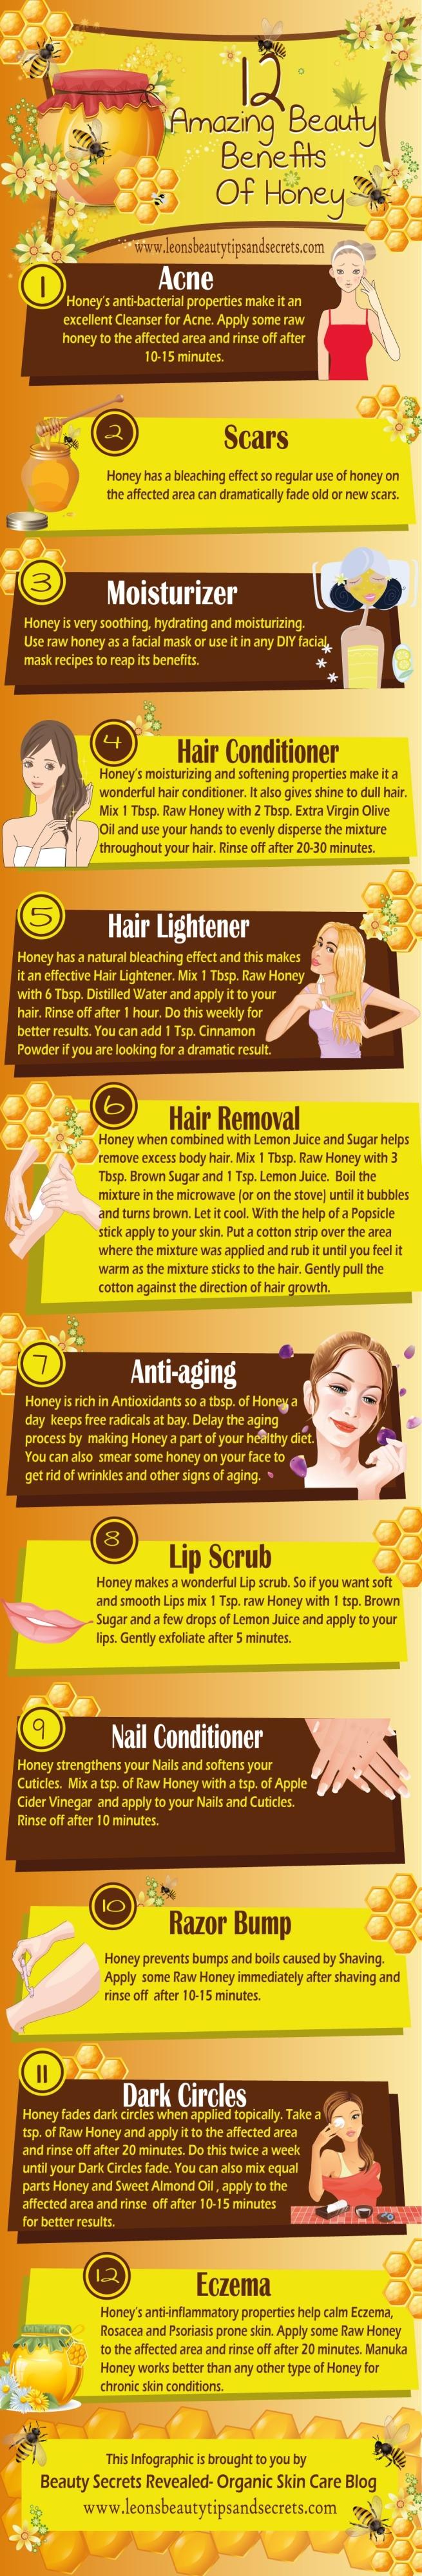 Beauty Benefits of Honey Infographic